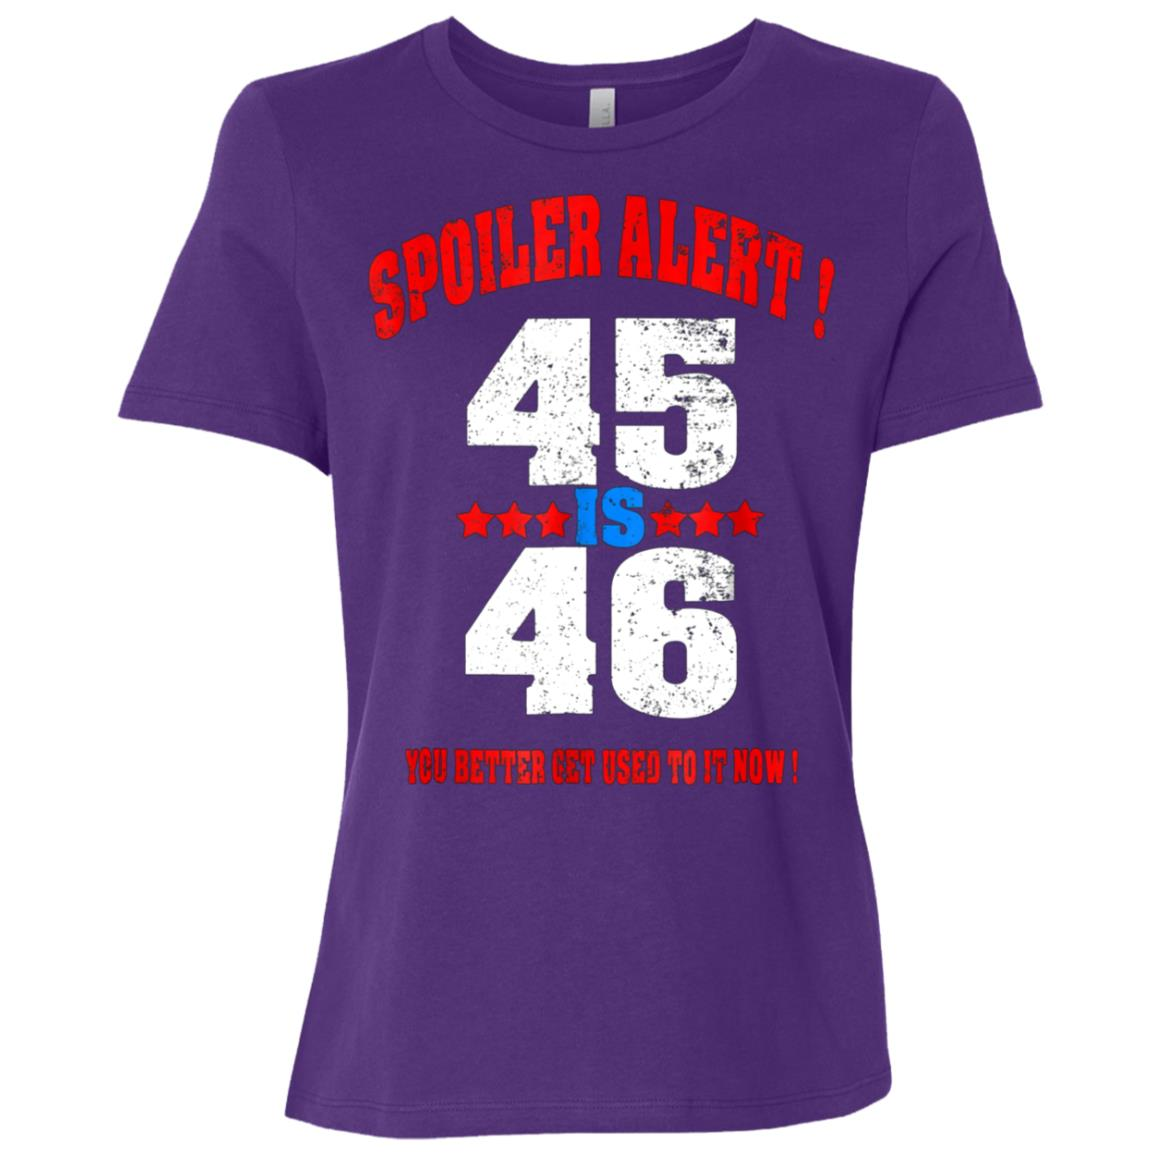 Pro Trump – Spoiler alert 45 is 46 Funny Supporter-1 Women Short Sleeve T-Shirt